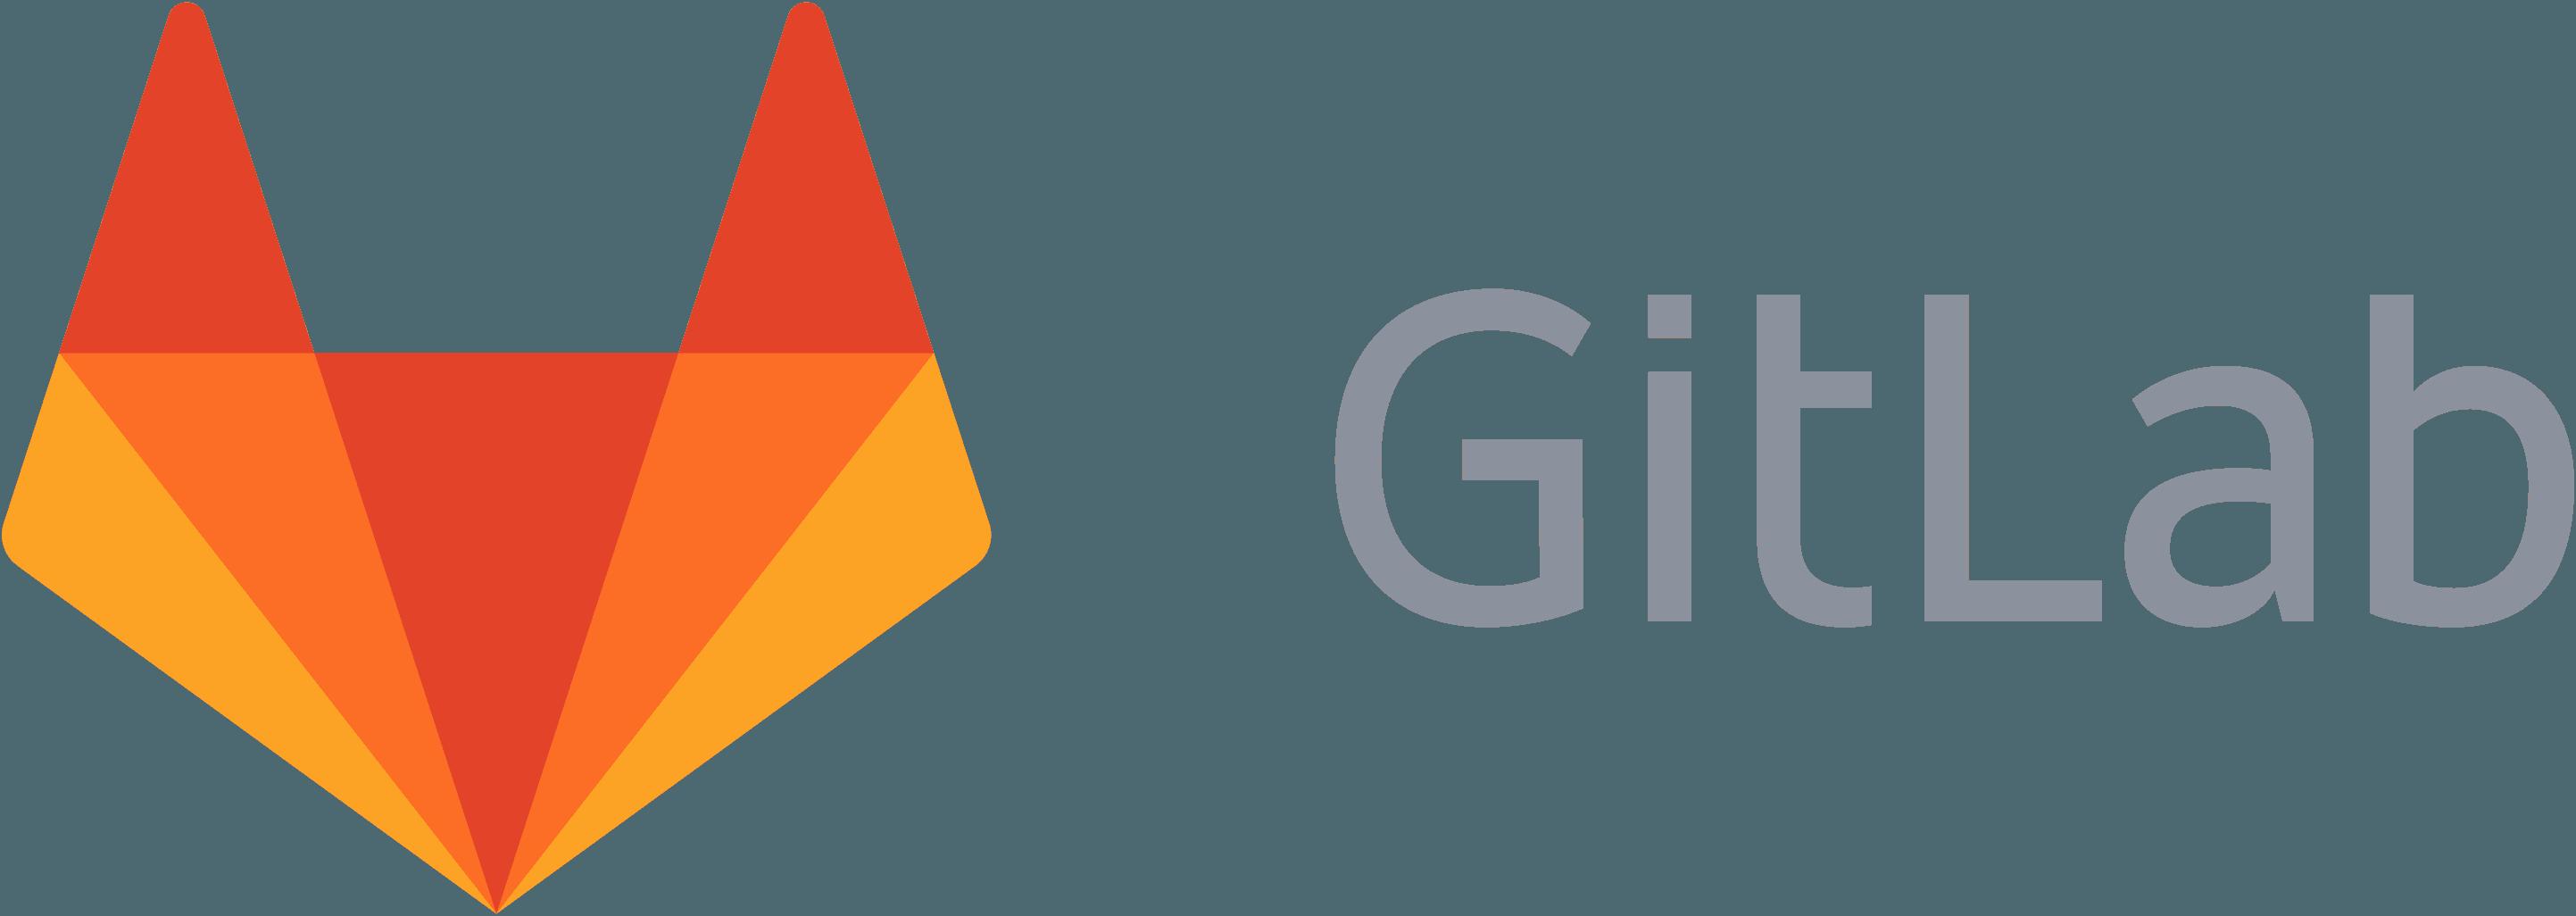 Get Git